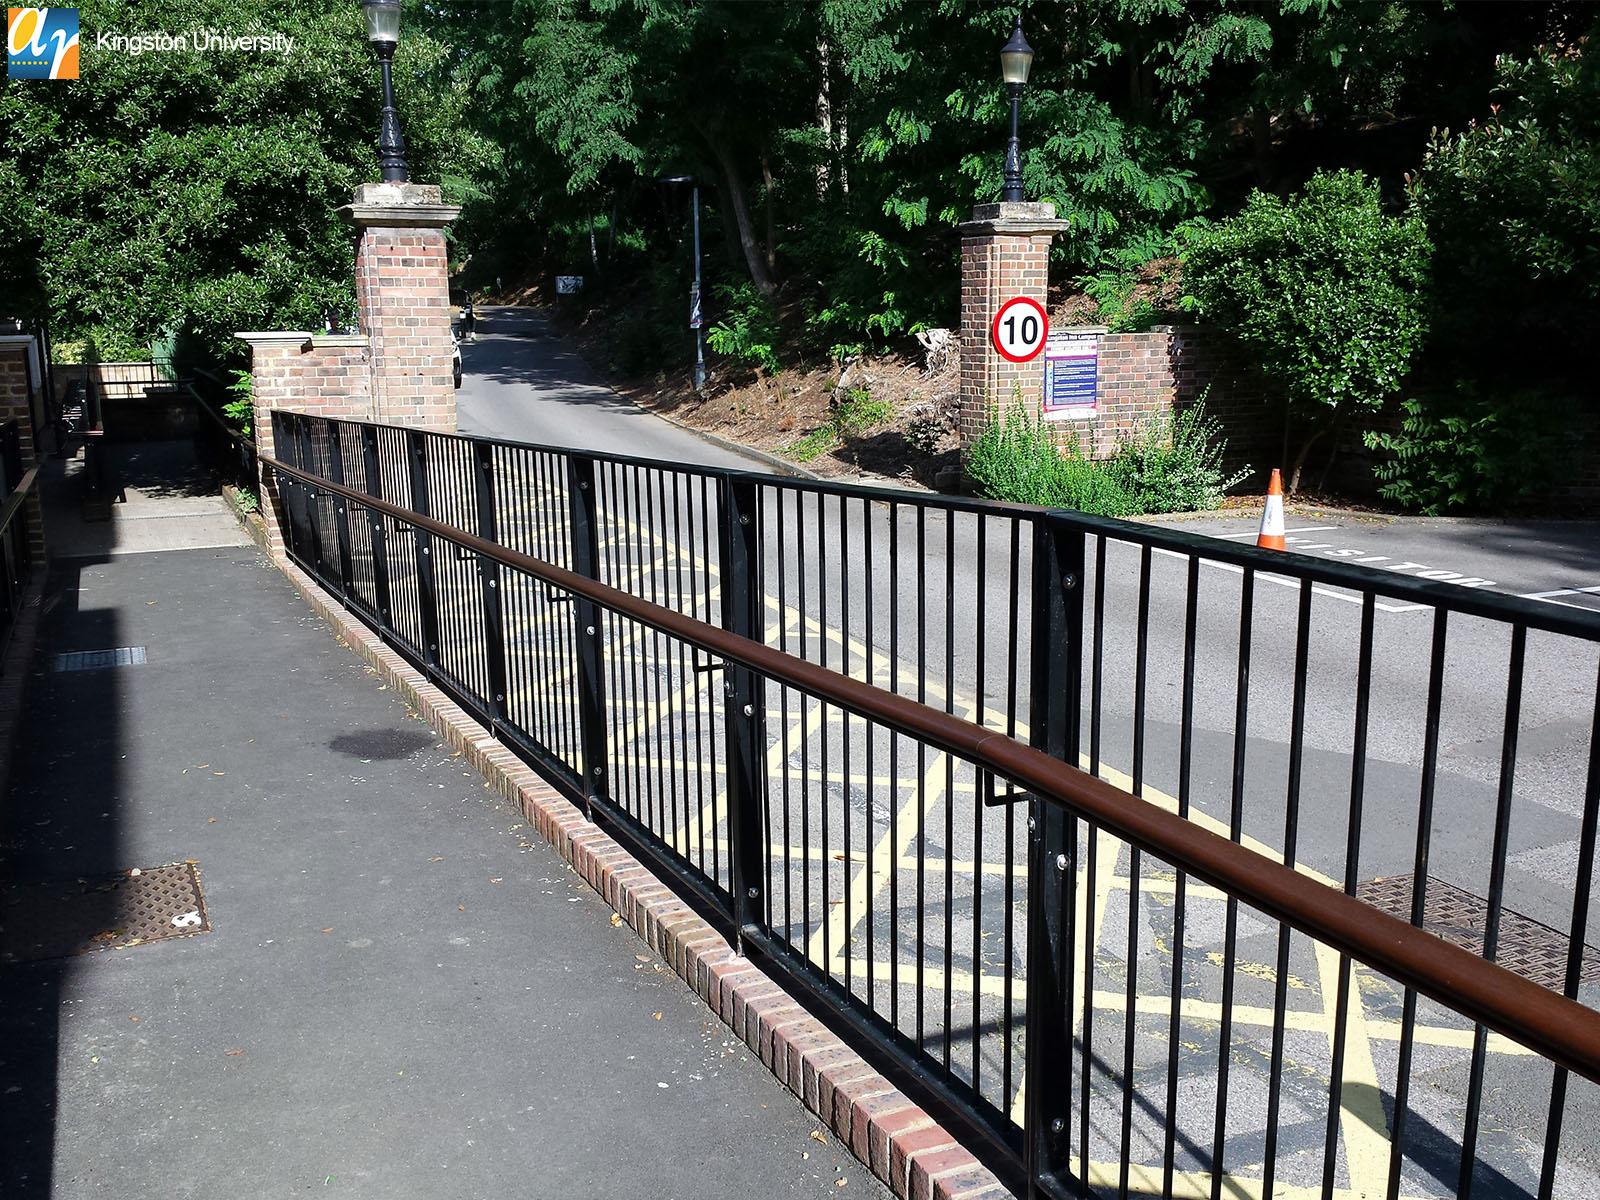 Kingston University metal railings and handrail